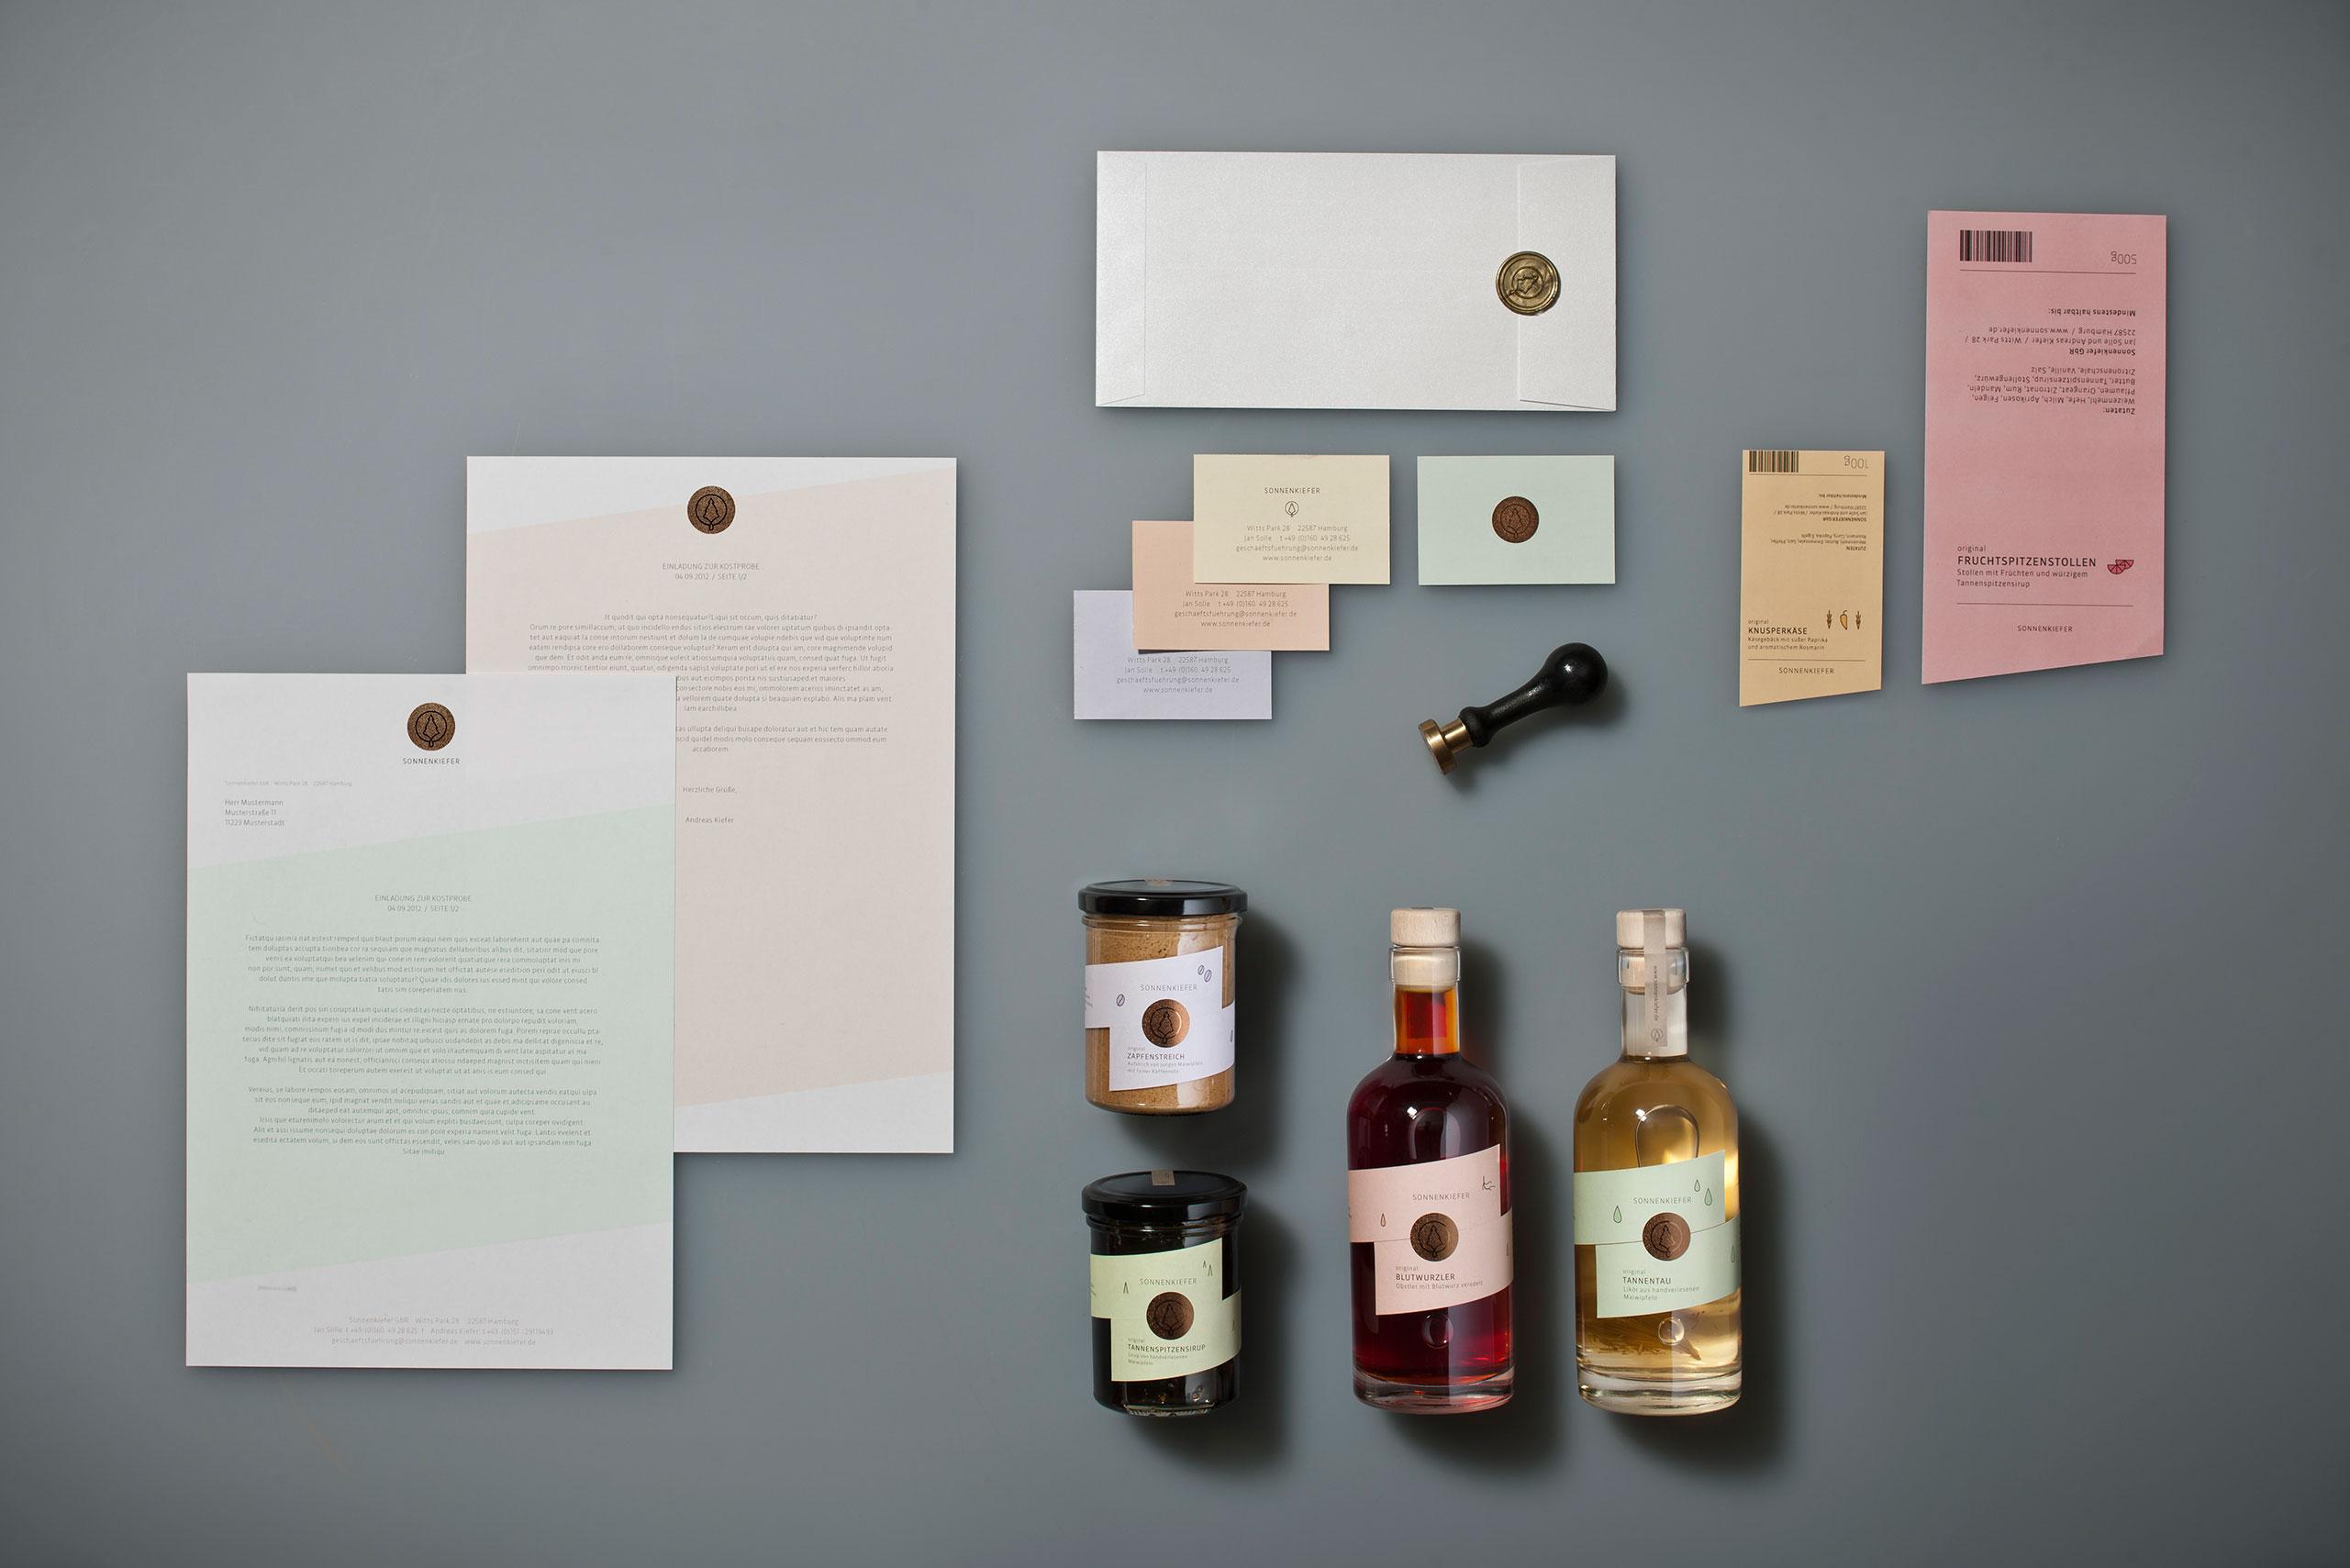 Speisekarten, Briefbogen, Visitenkarte, Verpackungsdesign, Verpackung, Siegel, Etikett, Alkohol, Sirup, Corprate Design